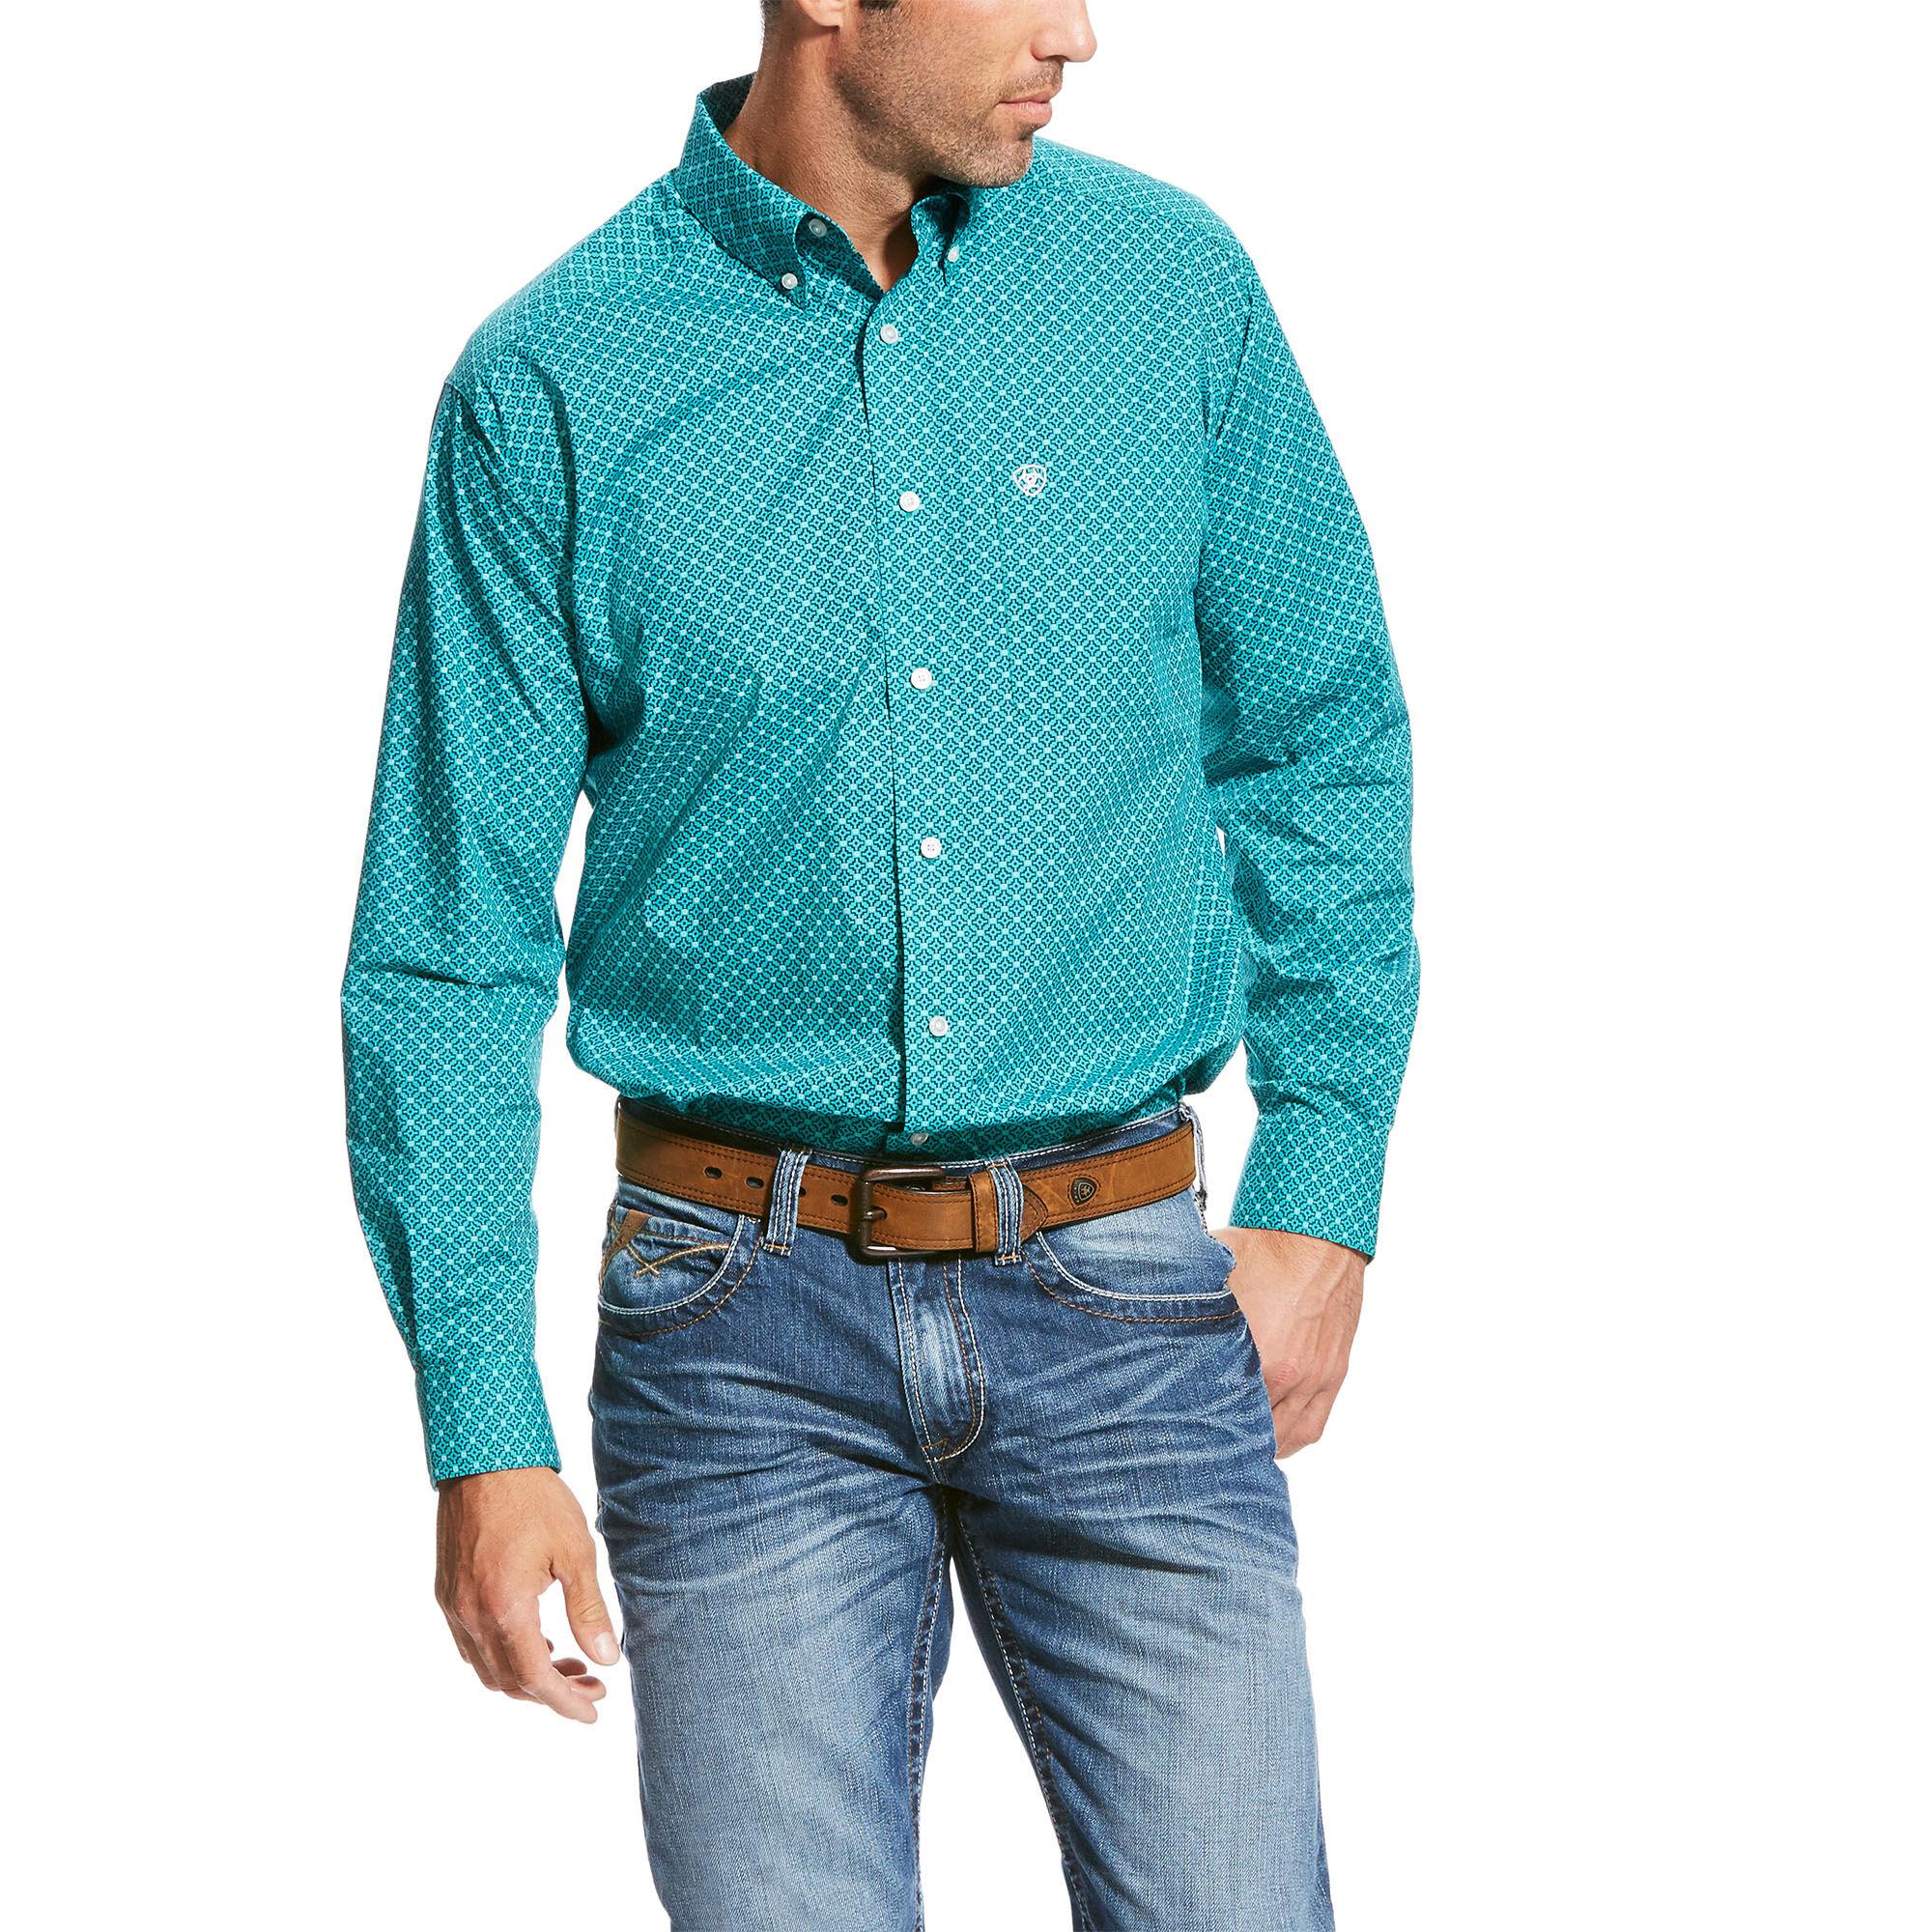 Vavrick Shirt